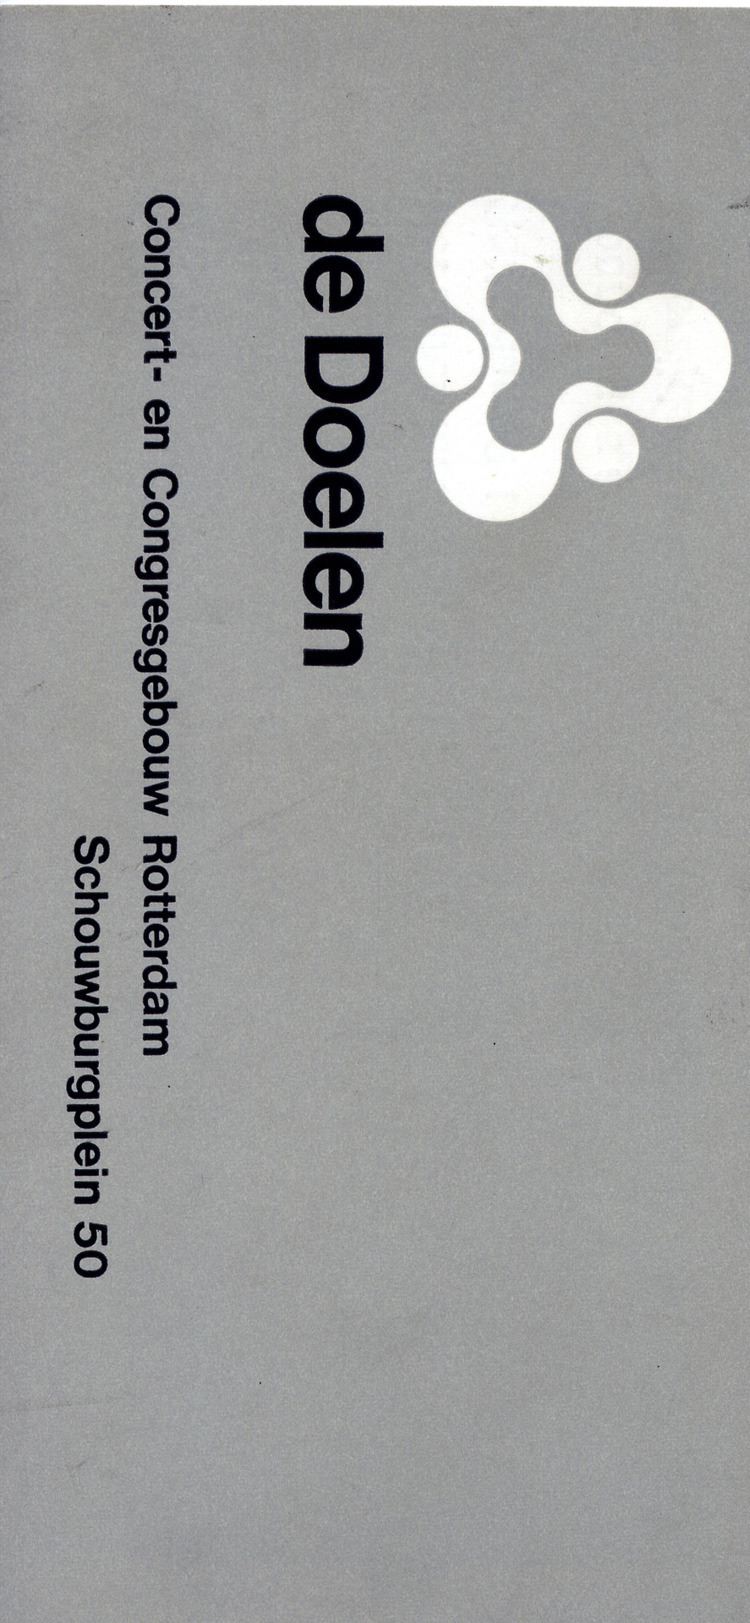 De Doelen, Benno Wissing - design - modernism_is_crap | ello